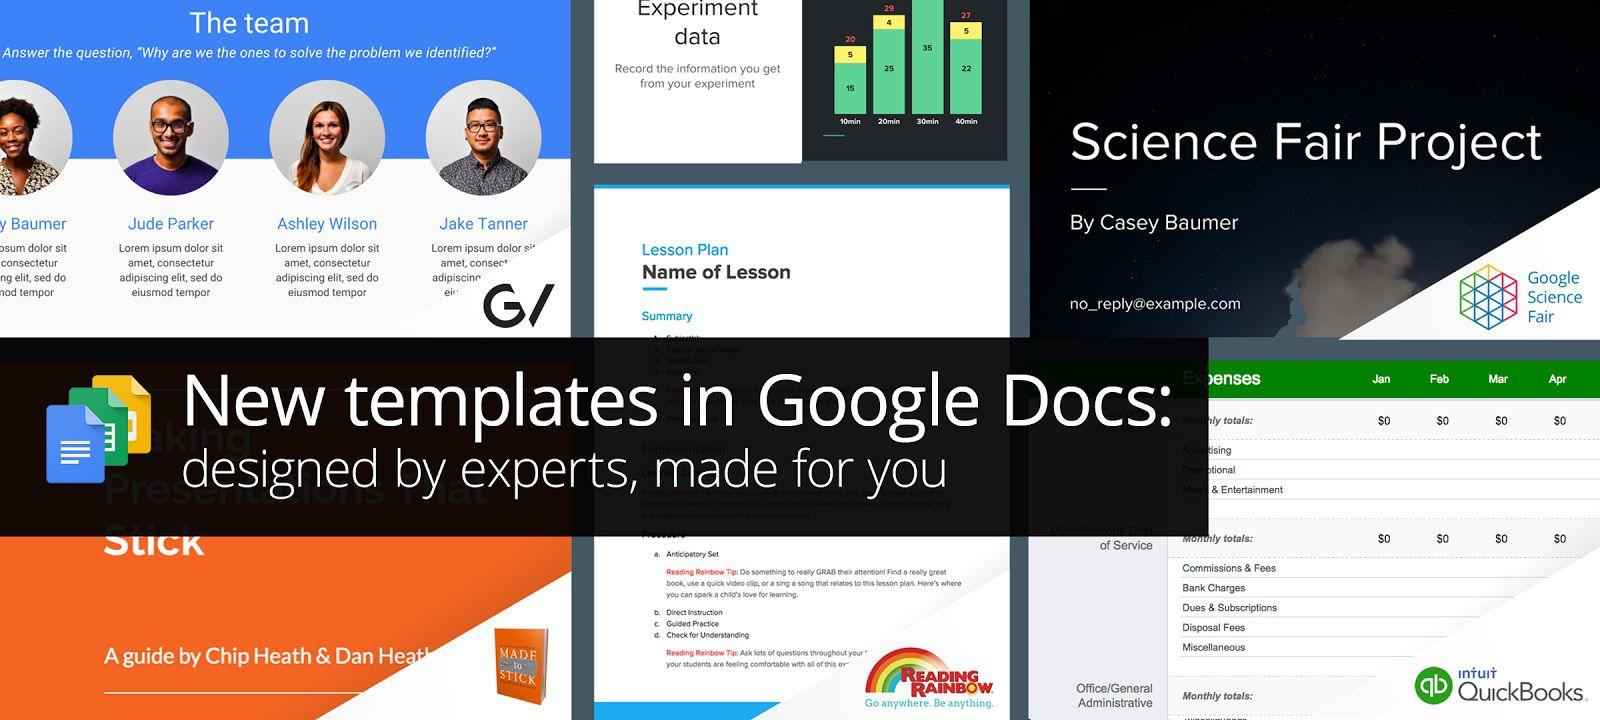 006 Frightening Free Google Doc Template Sample  Templates Menu For Teacher Flyer DownloadFull